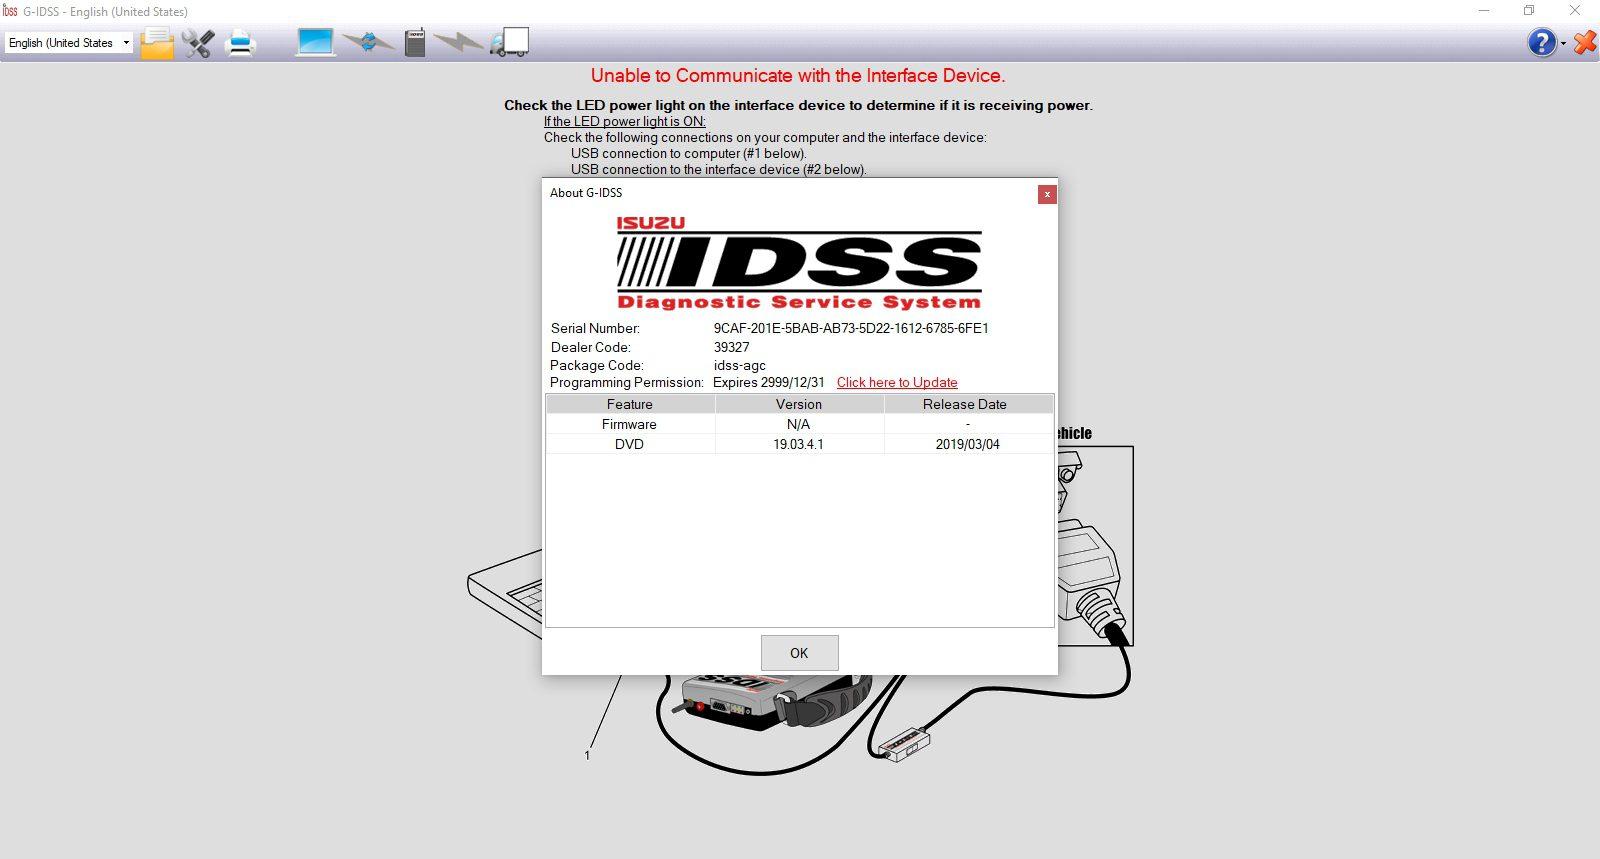 Isuzu_IDSS_Release_2019_Diagnostic_Service_System_2